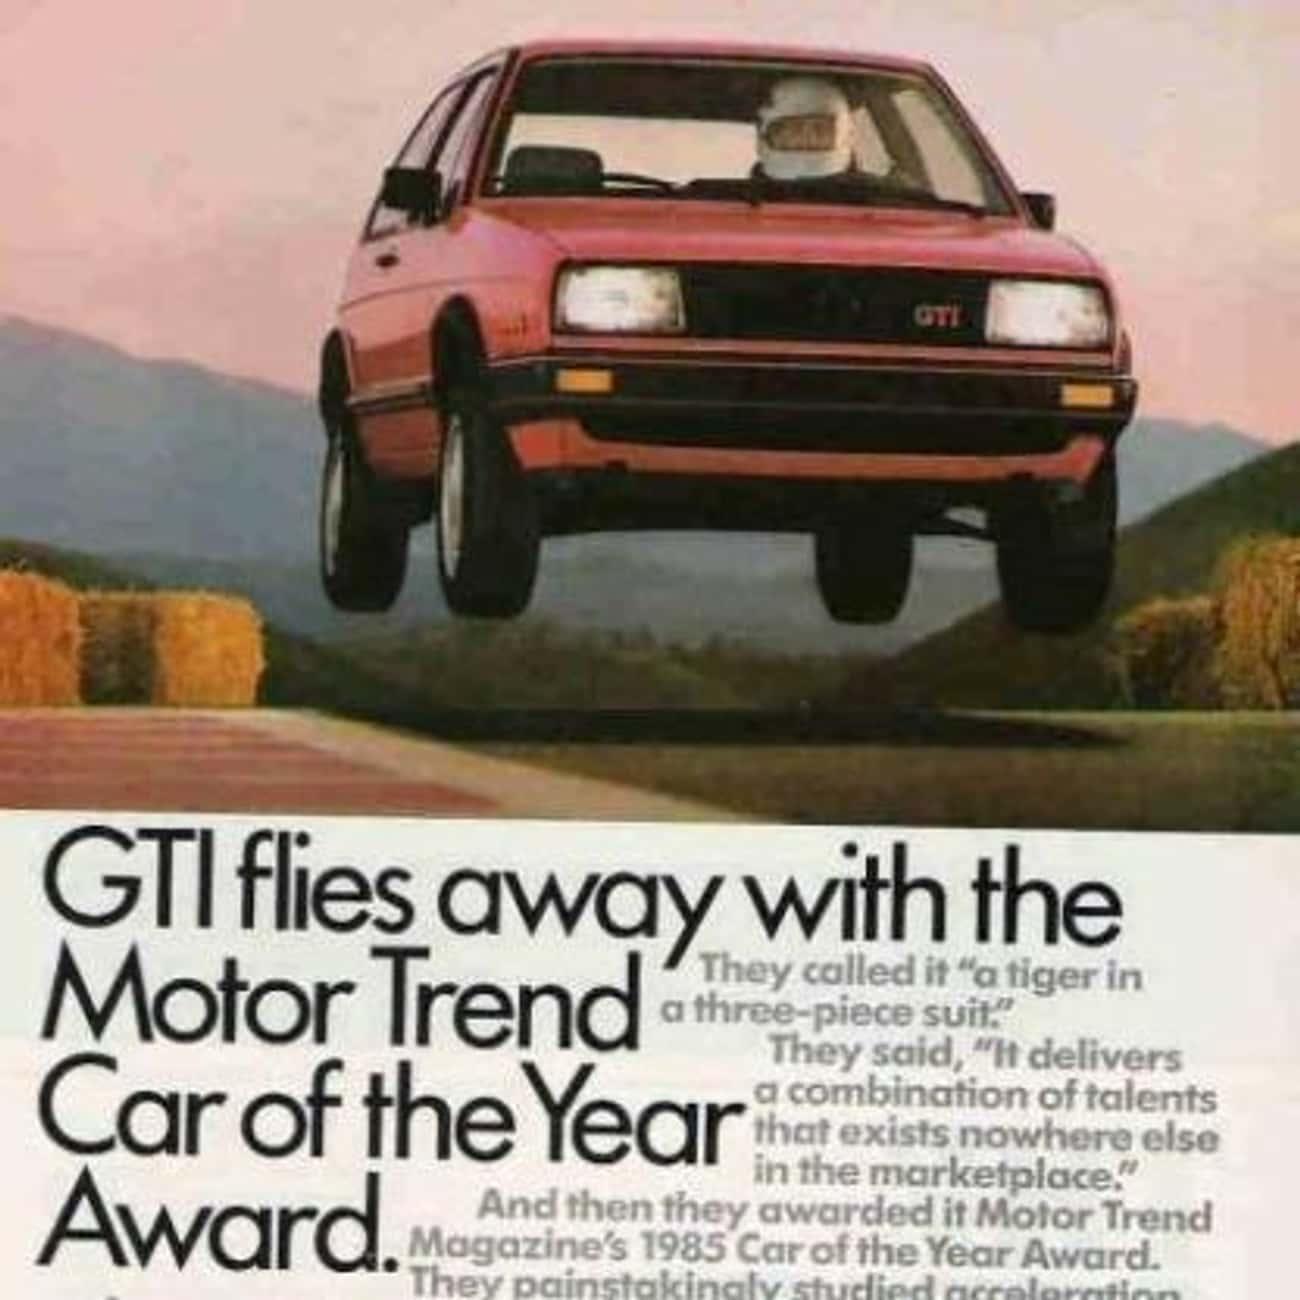 1985 Volkswagen GTI is listed (or ranked) 2 on the list List of Popular Volkswagen Passenger Cars Hatchbacks